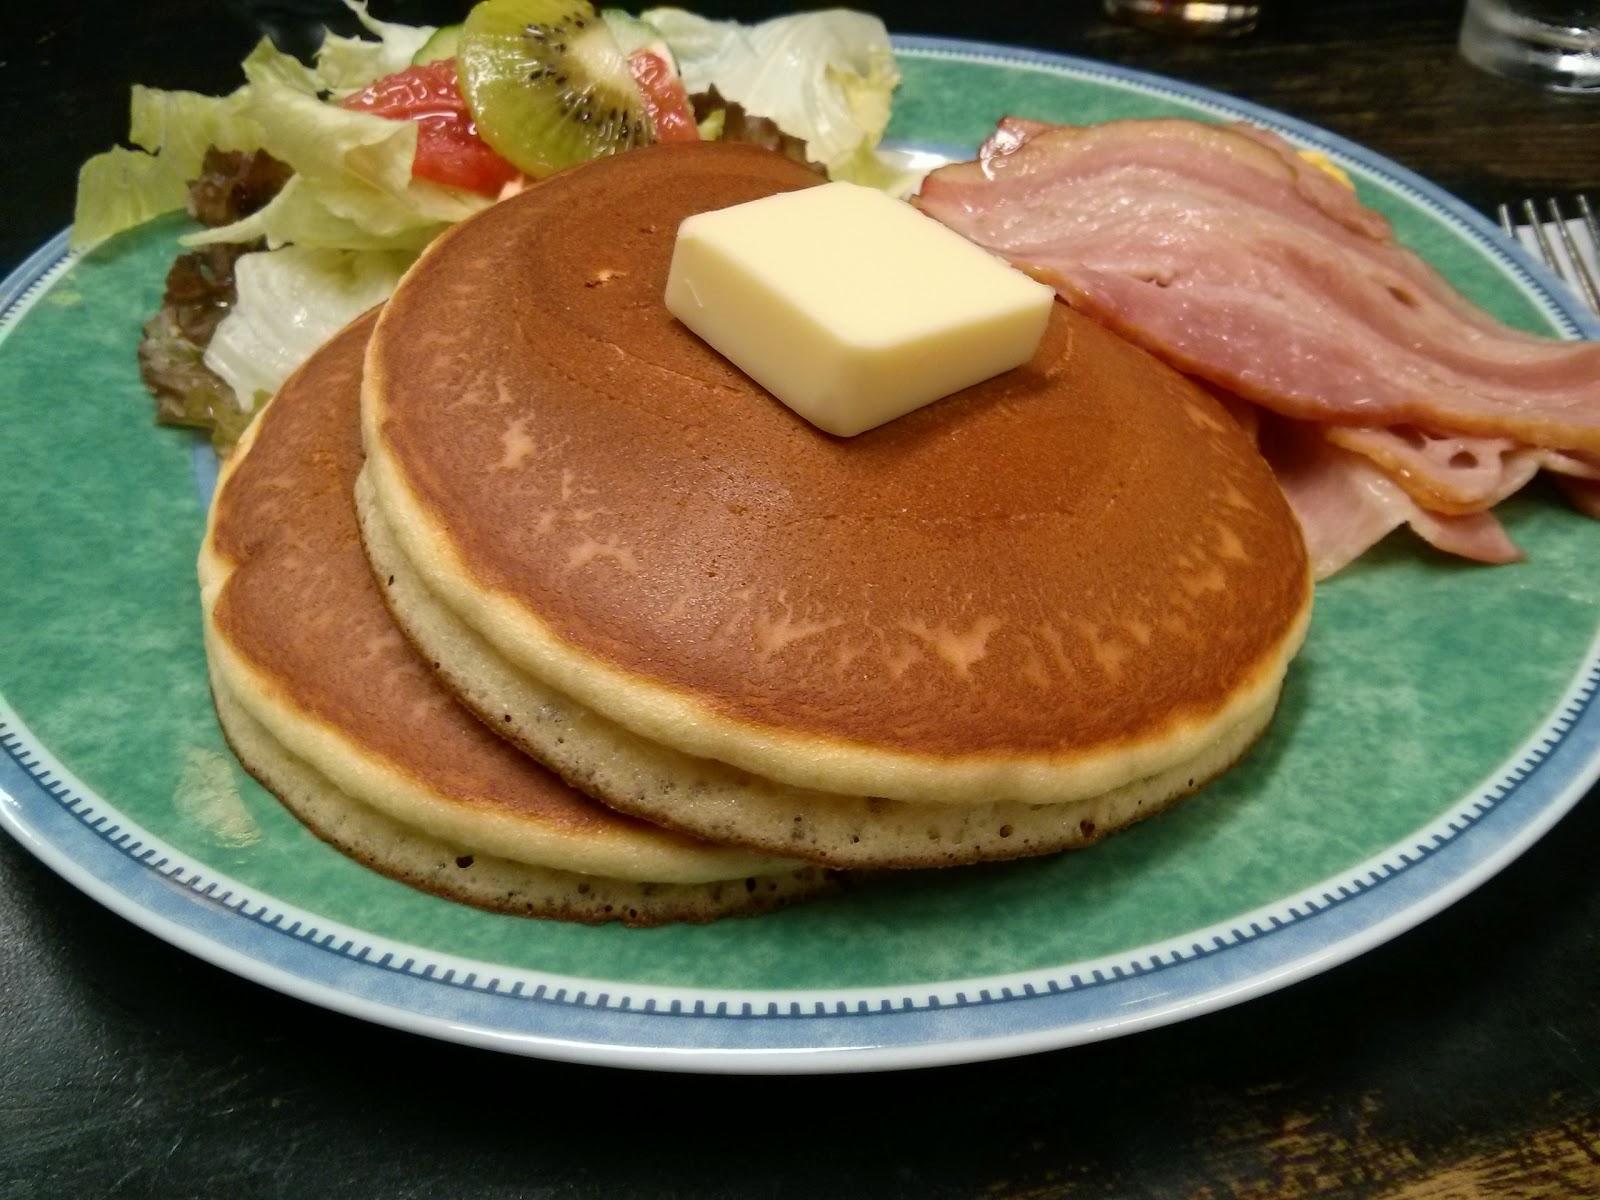 Bon Appétit! No Cake No Life: 日本橋「花時計」でホットケーキランチ